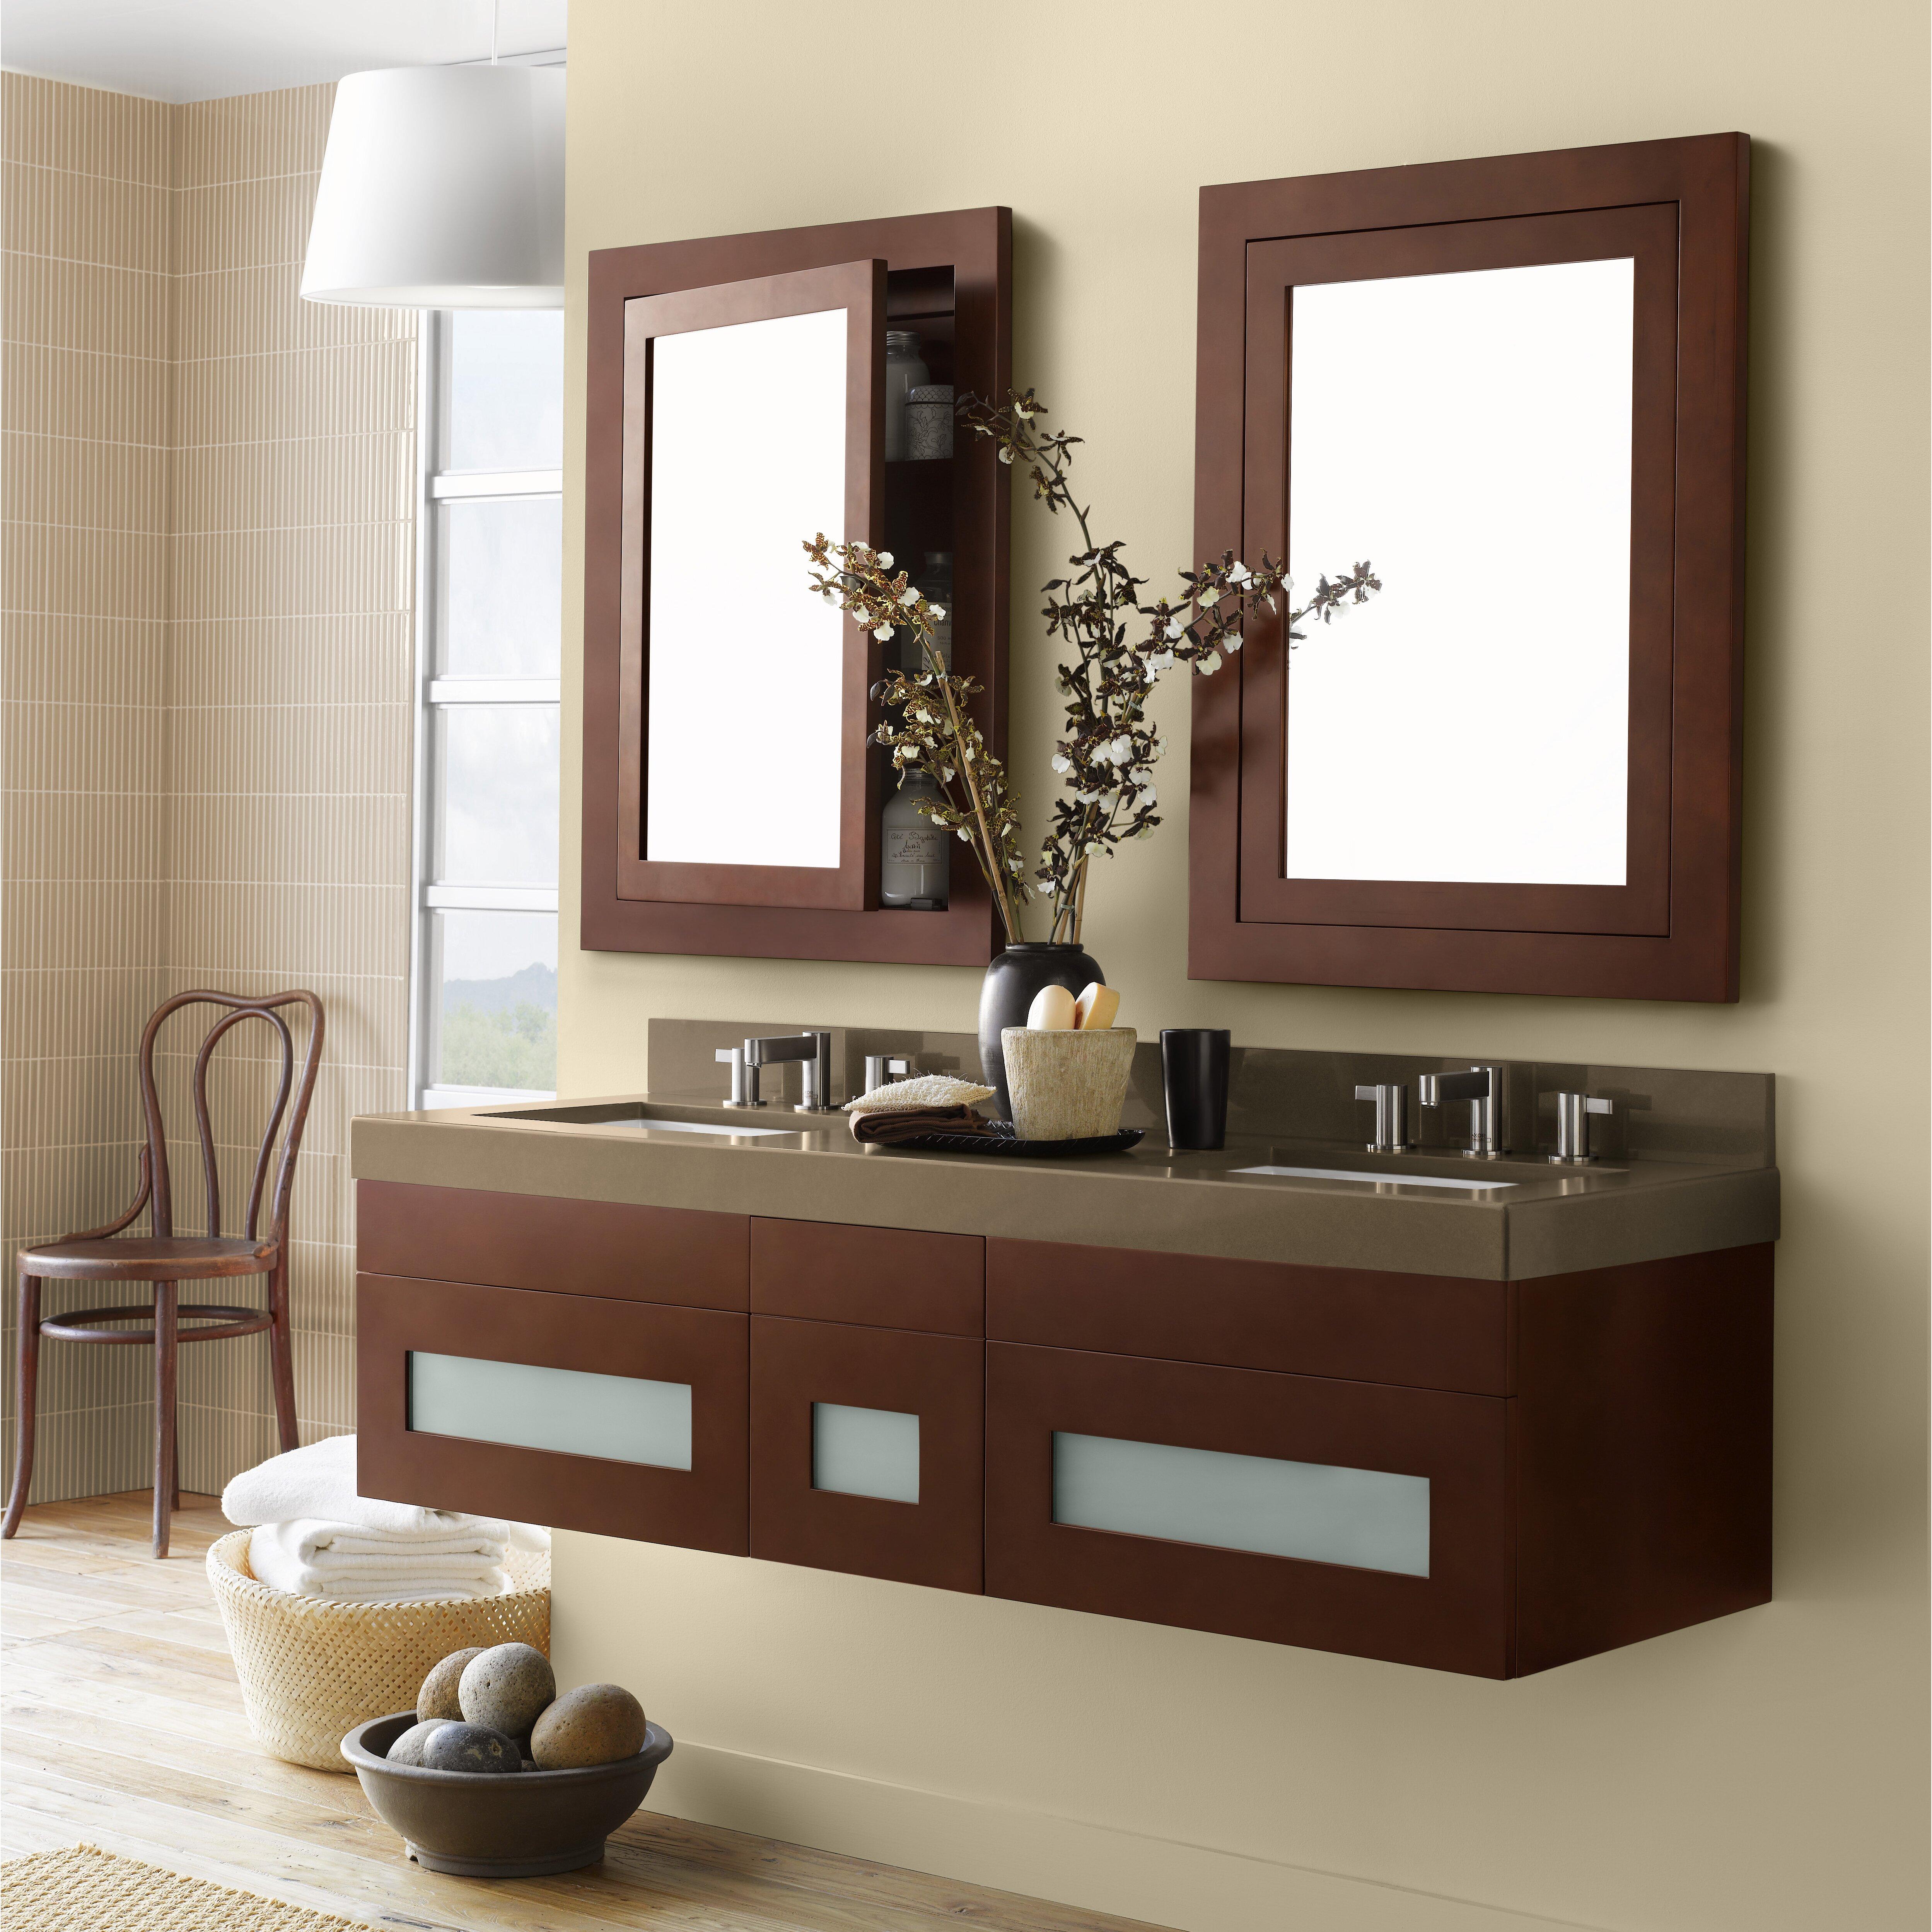 Ronbow Rebecca 58 Double Wall Mount Bathroom Vanity Set Reviews – 58 Bathroom Vanity